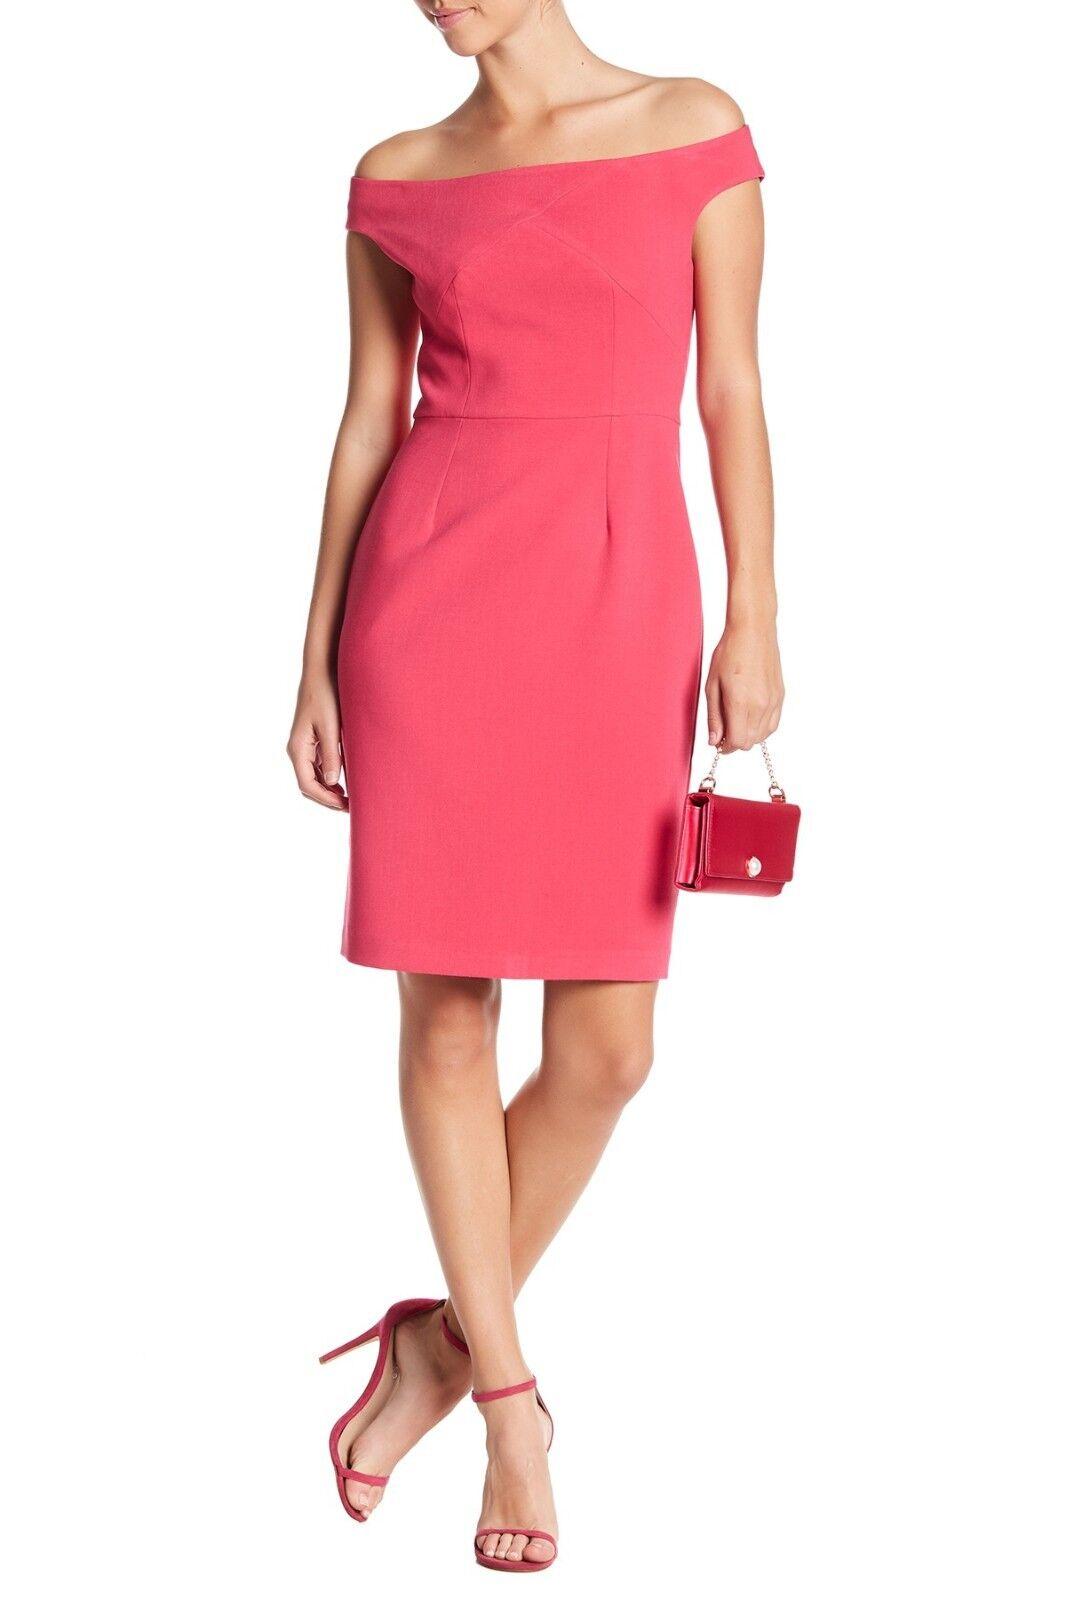 NWT schwarz Halo Claire Off-the-Shoulder Short Sleeves Dress Rosa Größe 2